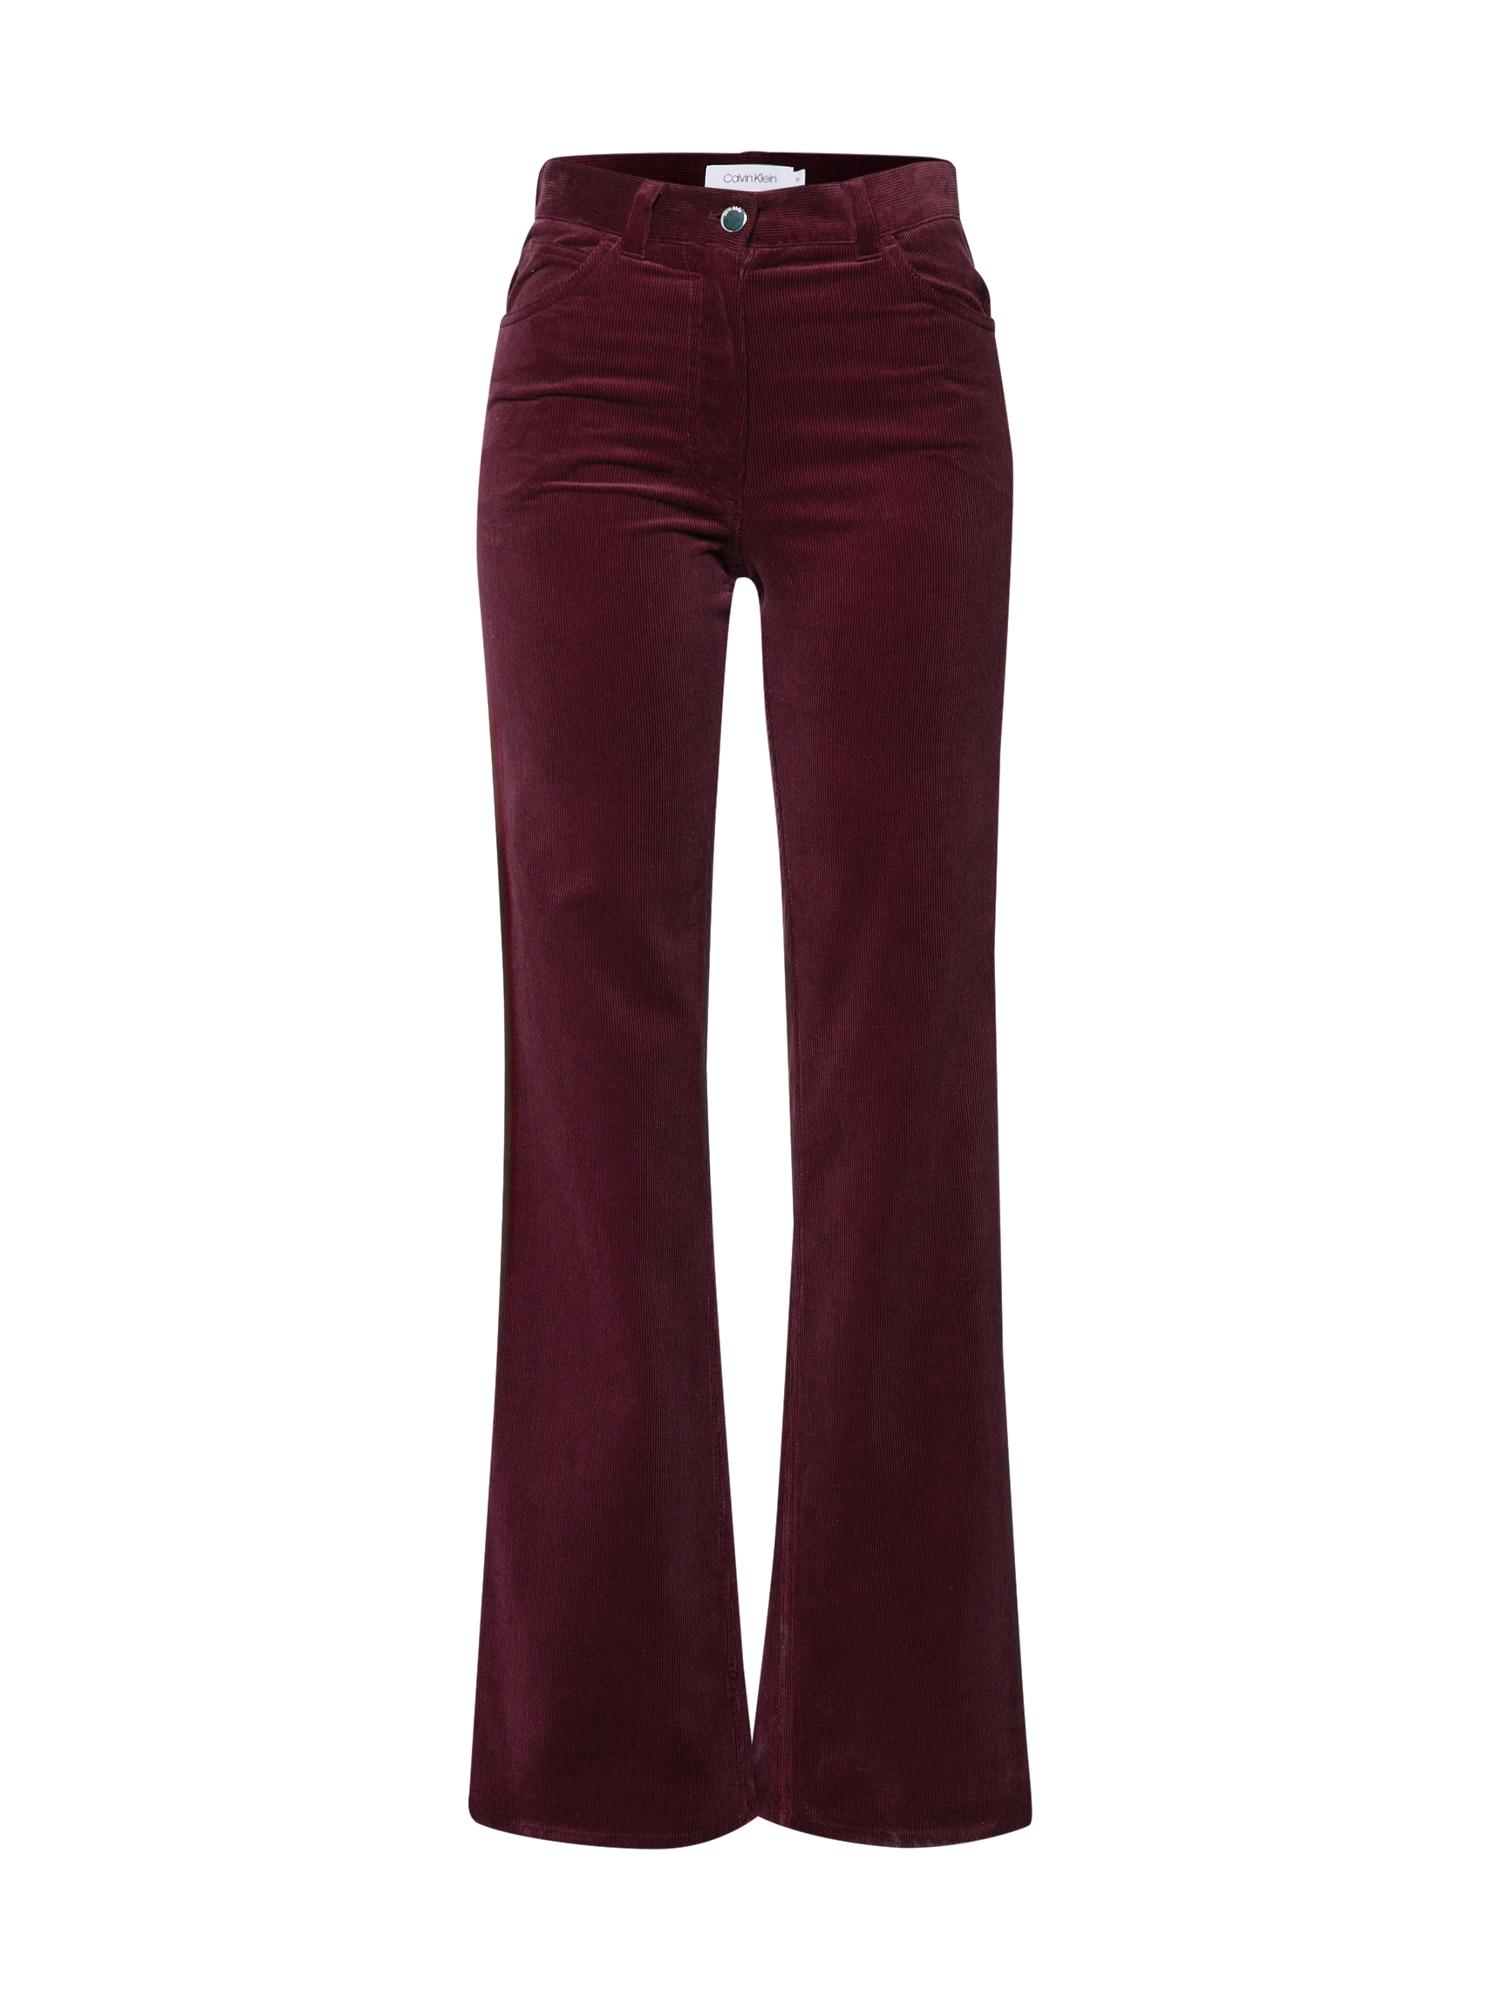 Kalhoty CORDUROY tmavě červená Calvin Klein